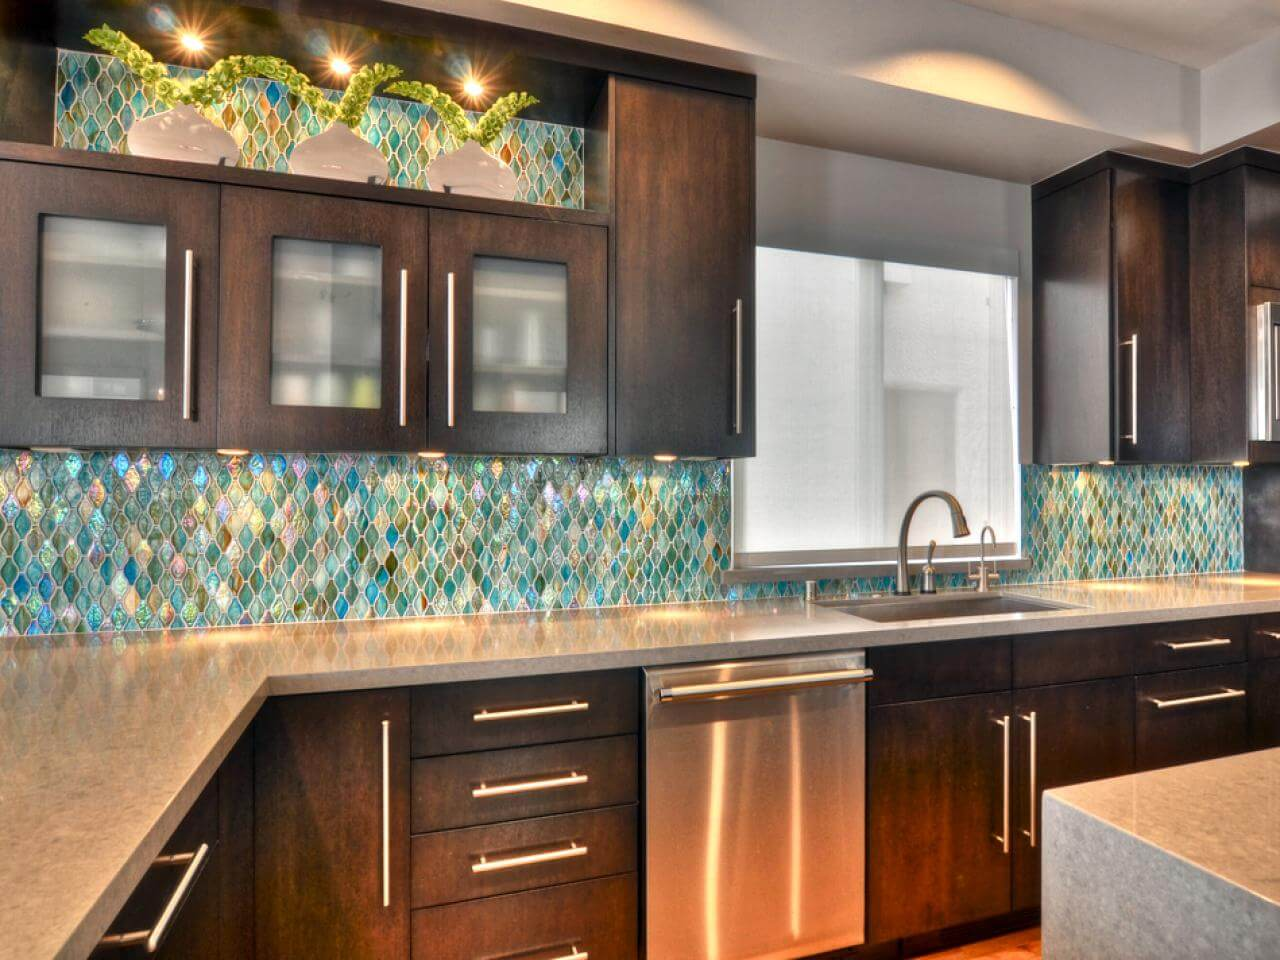 Reflective kitchen cabinet lighting